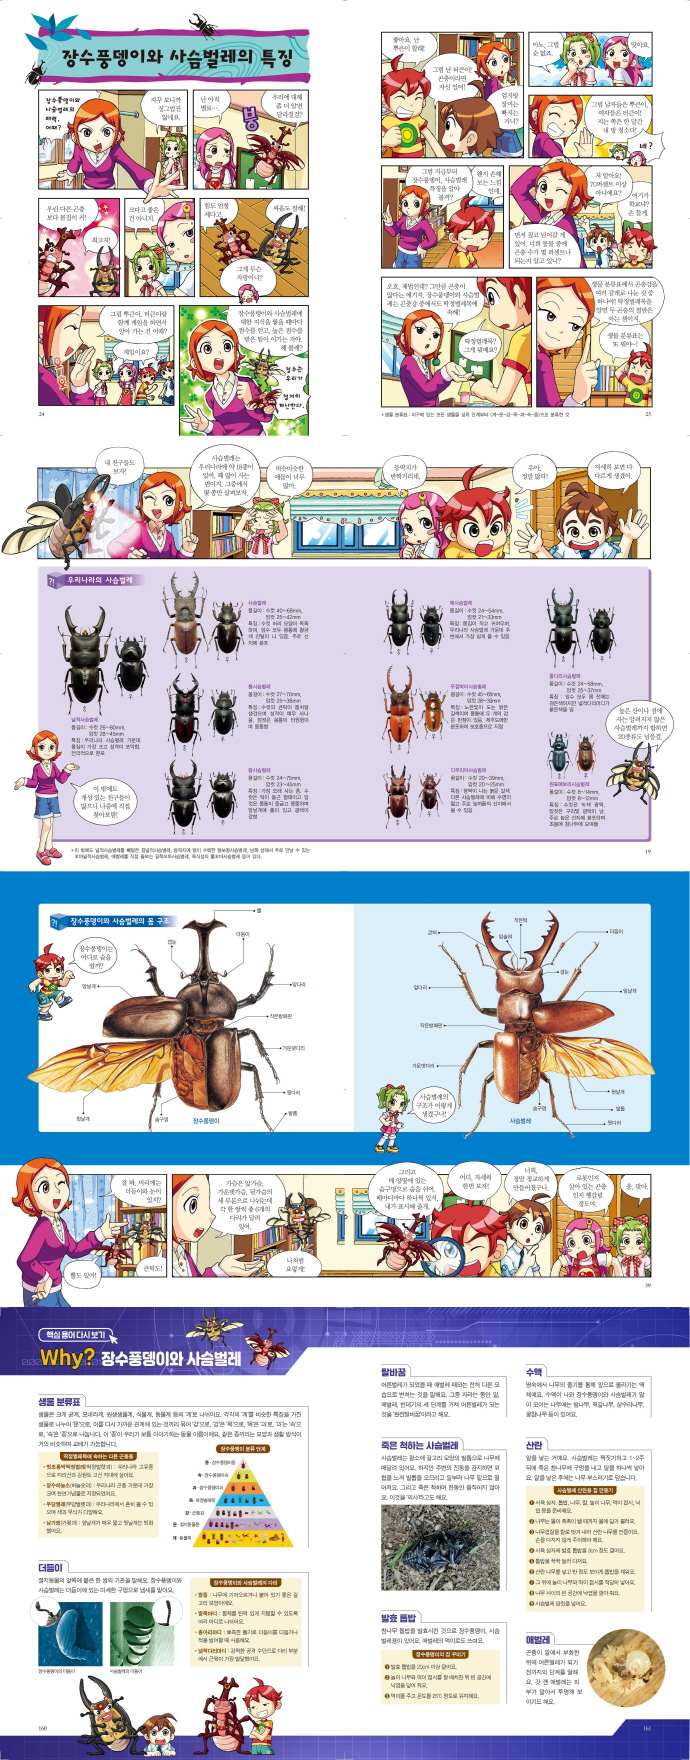 Why? 장수풍뎅이와 사슴벌레(초등과학학습만화 44)(양장본 HardCover) 도서 상세이미지